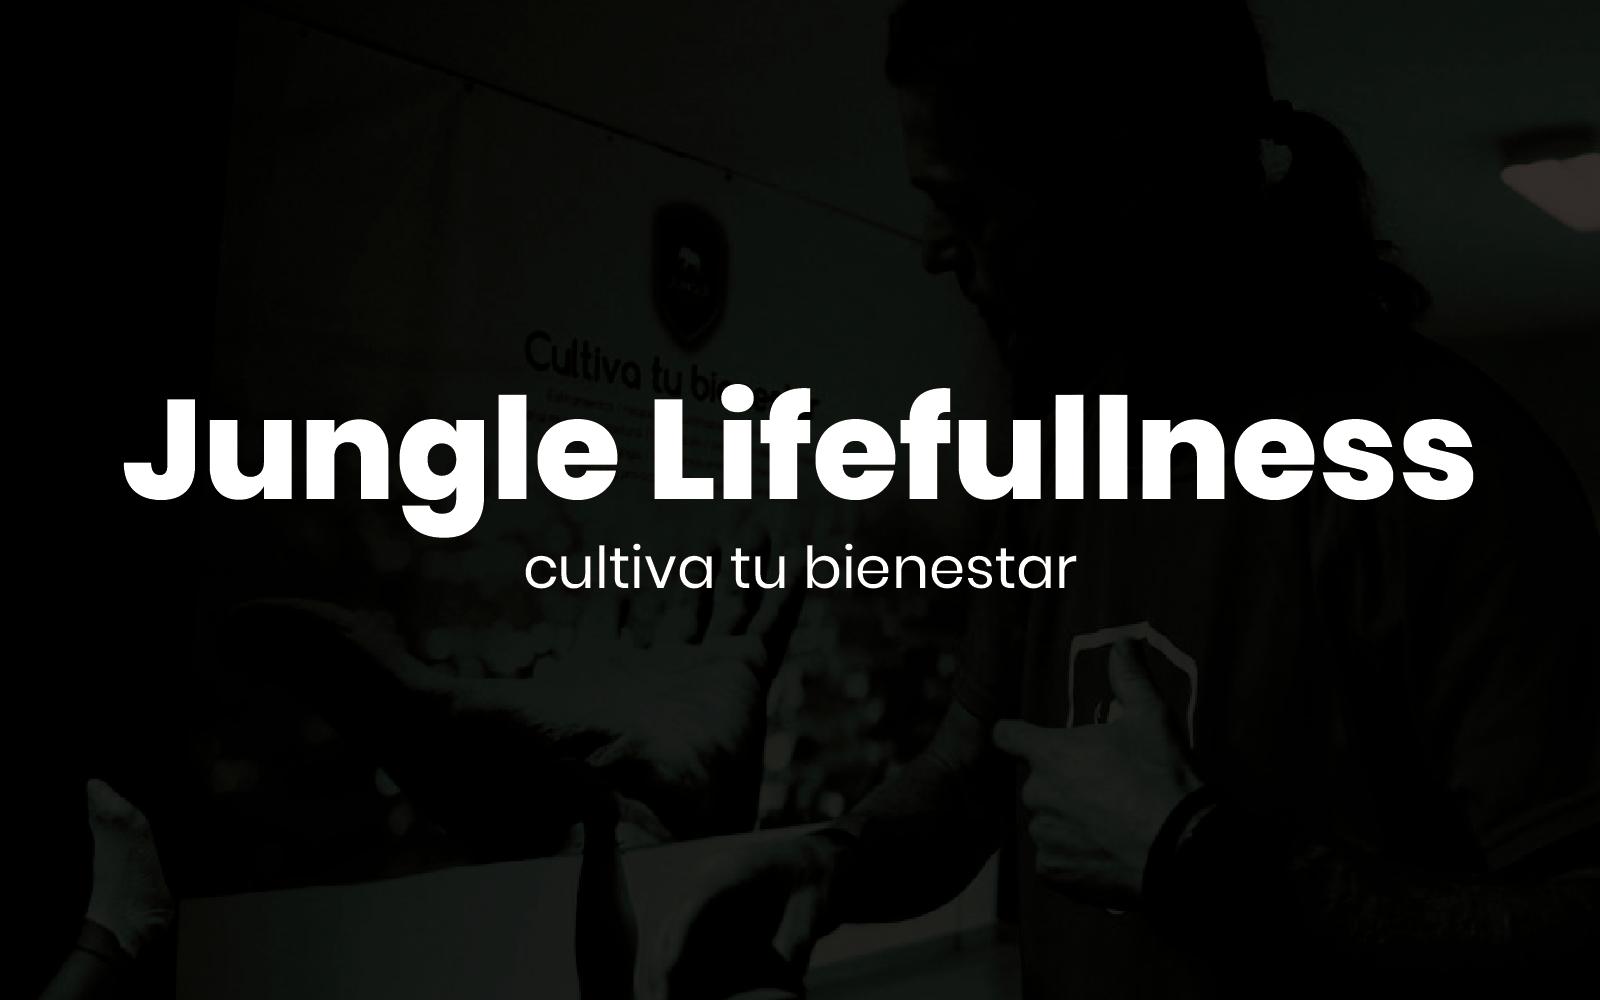 Jungle Lifefullness